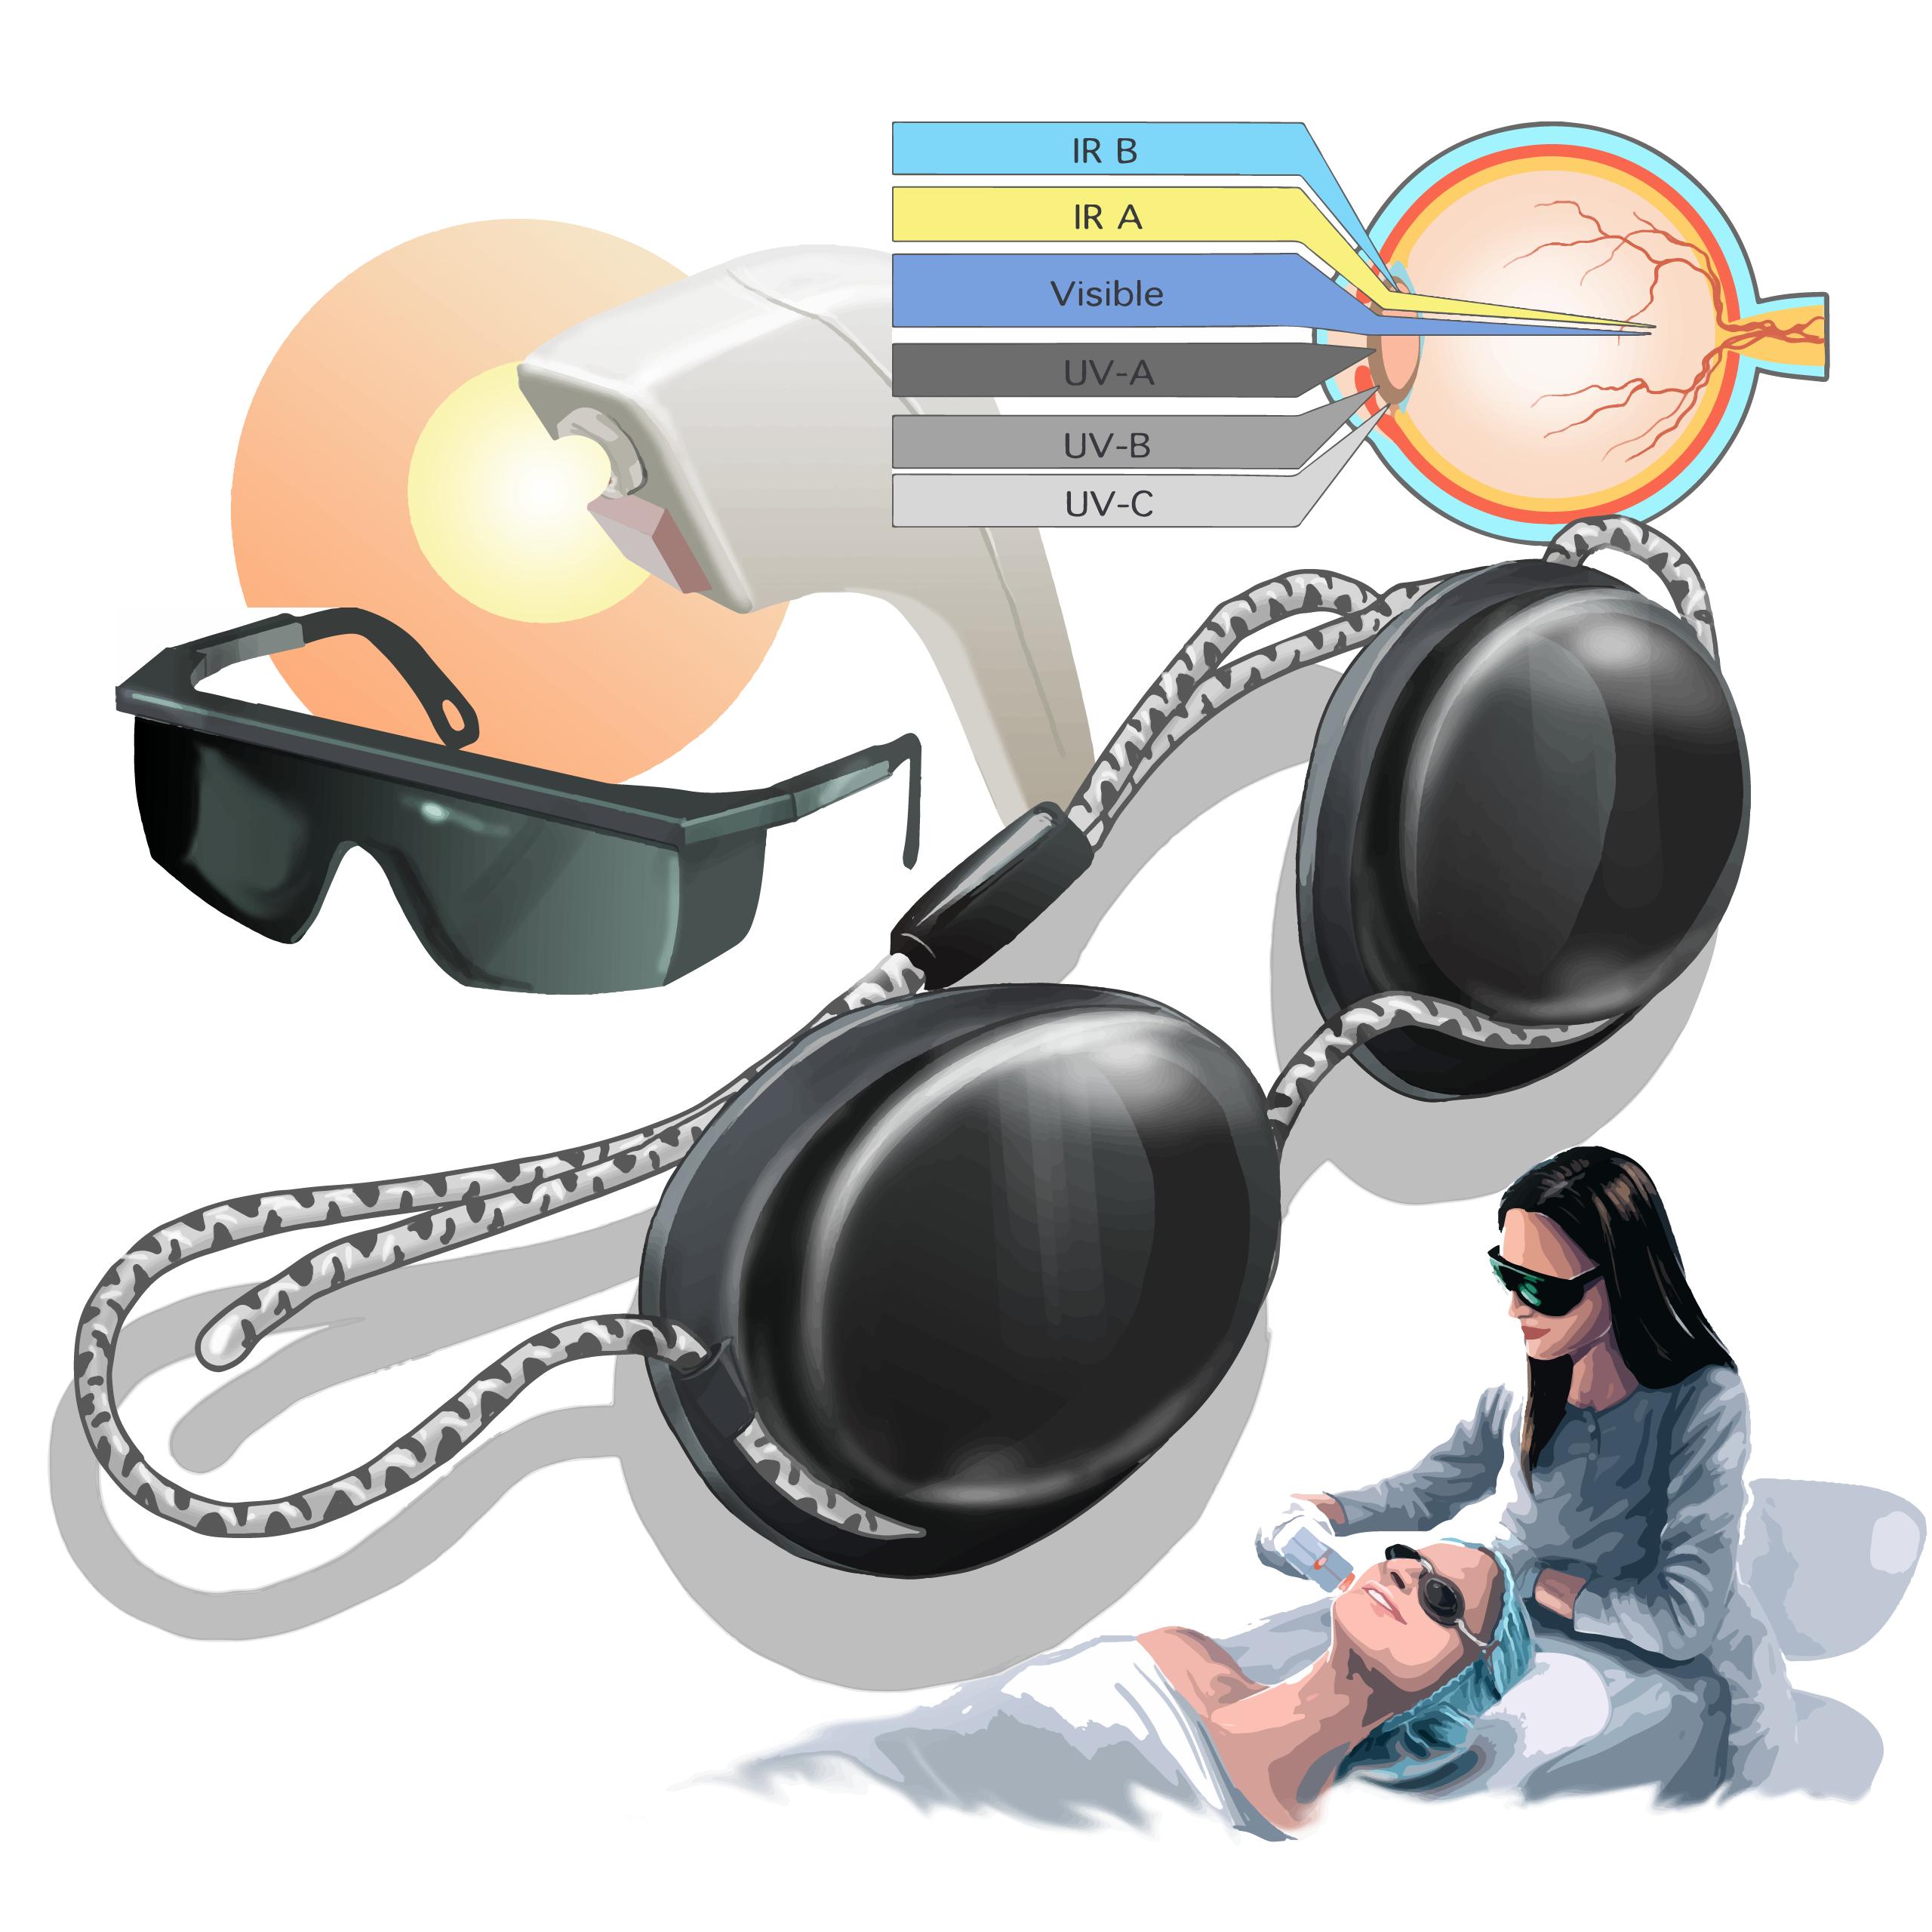 ipl-safety-glasses-thumbnail.png